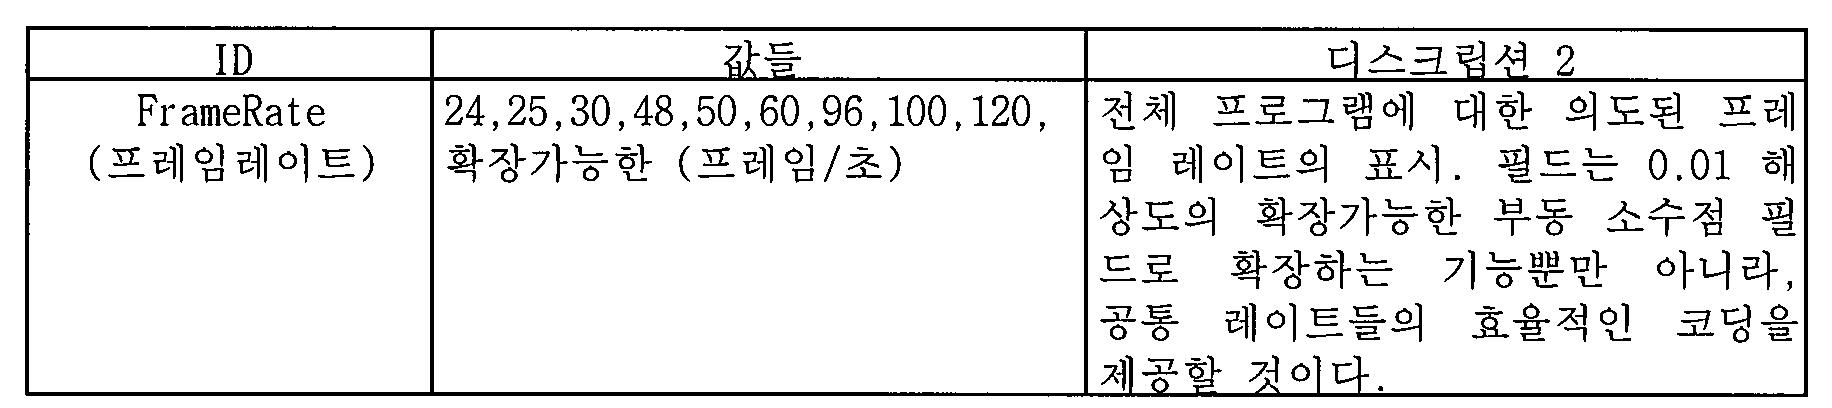 Figure 112014128070760-pat00001